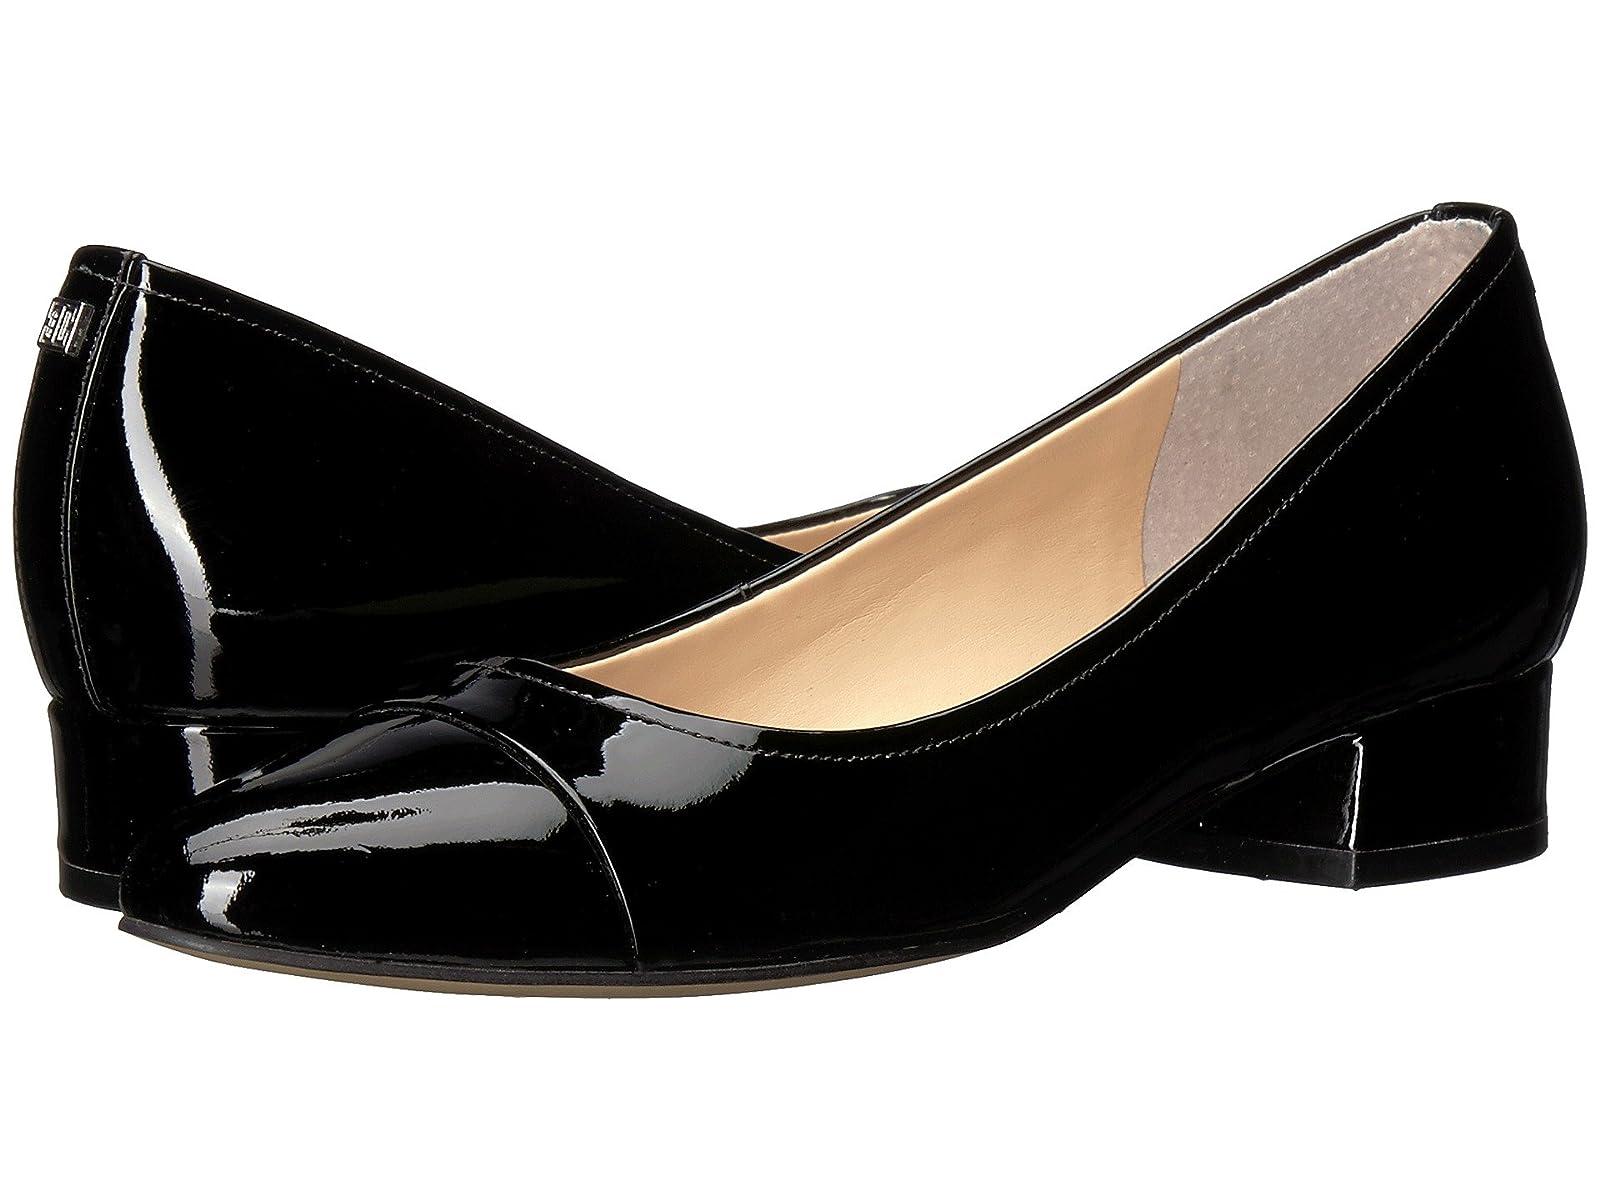 Ivanka Trump LarrieCheap and distinctive eye-catching shoes